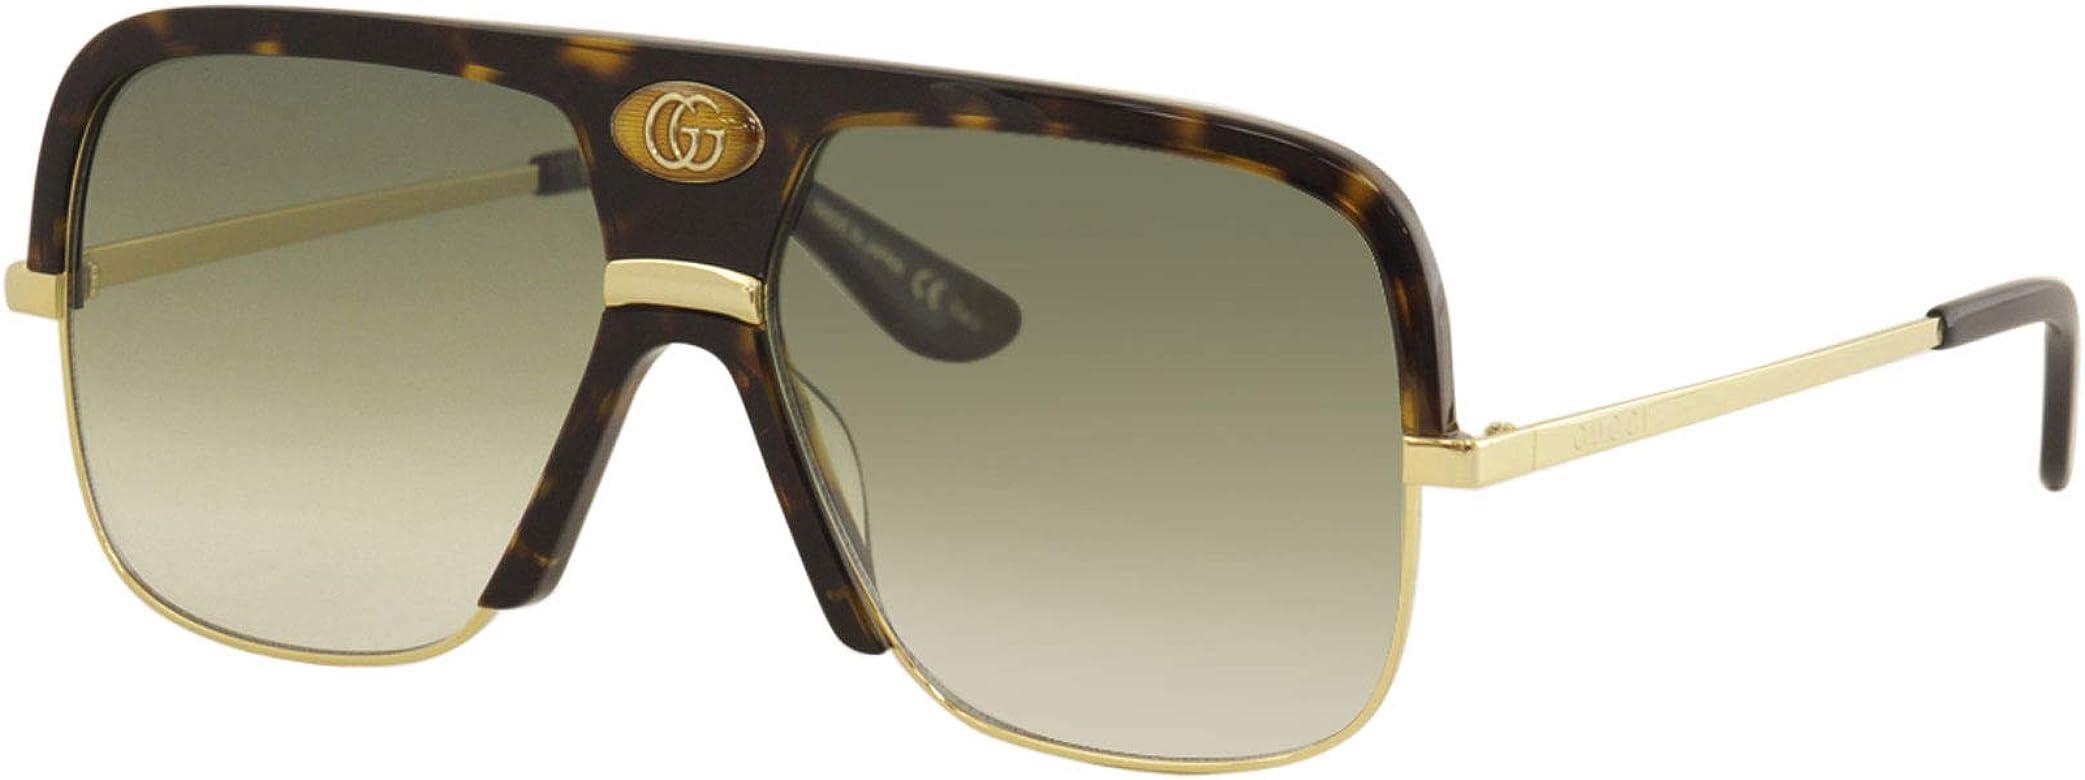 174bcd7fe17f Amazon.com: Sunglasses Gucci GG 0478 S- 002 HAVANA/GREEN GOLD: Clothing